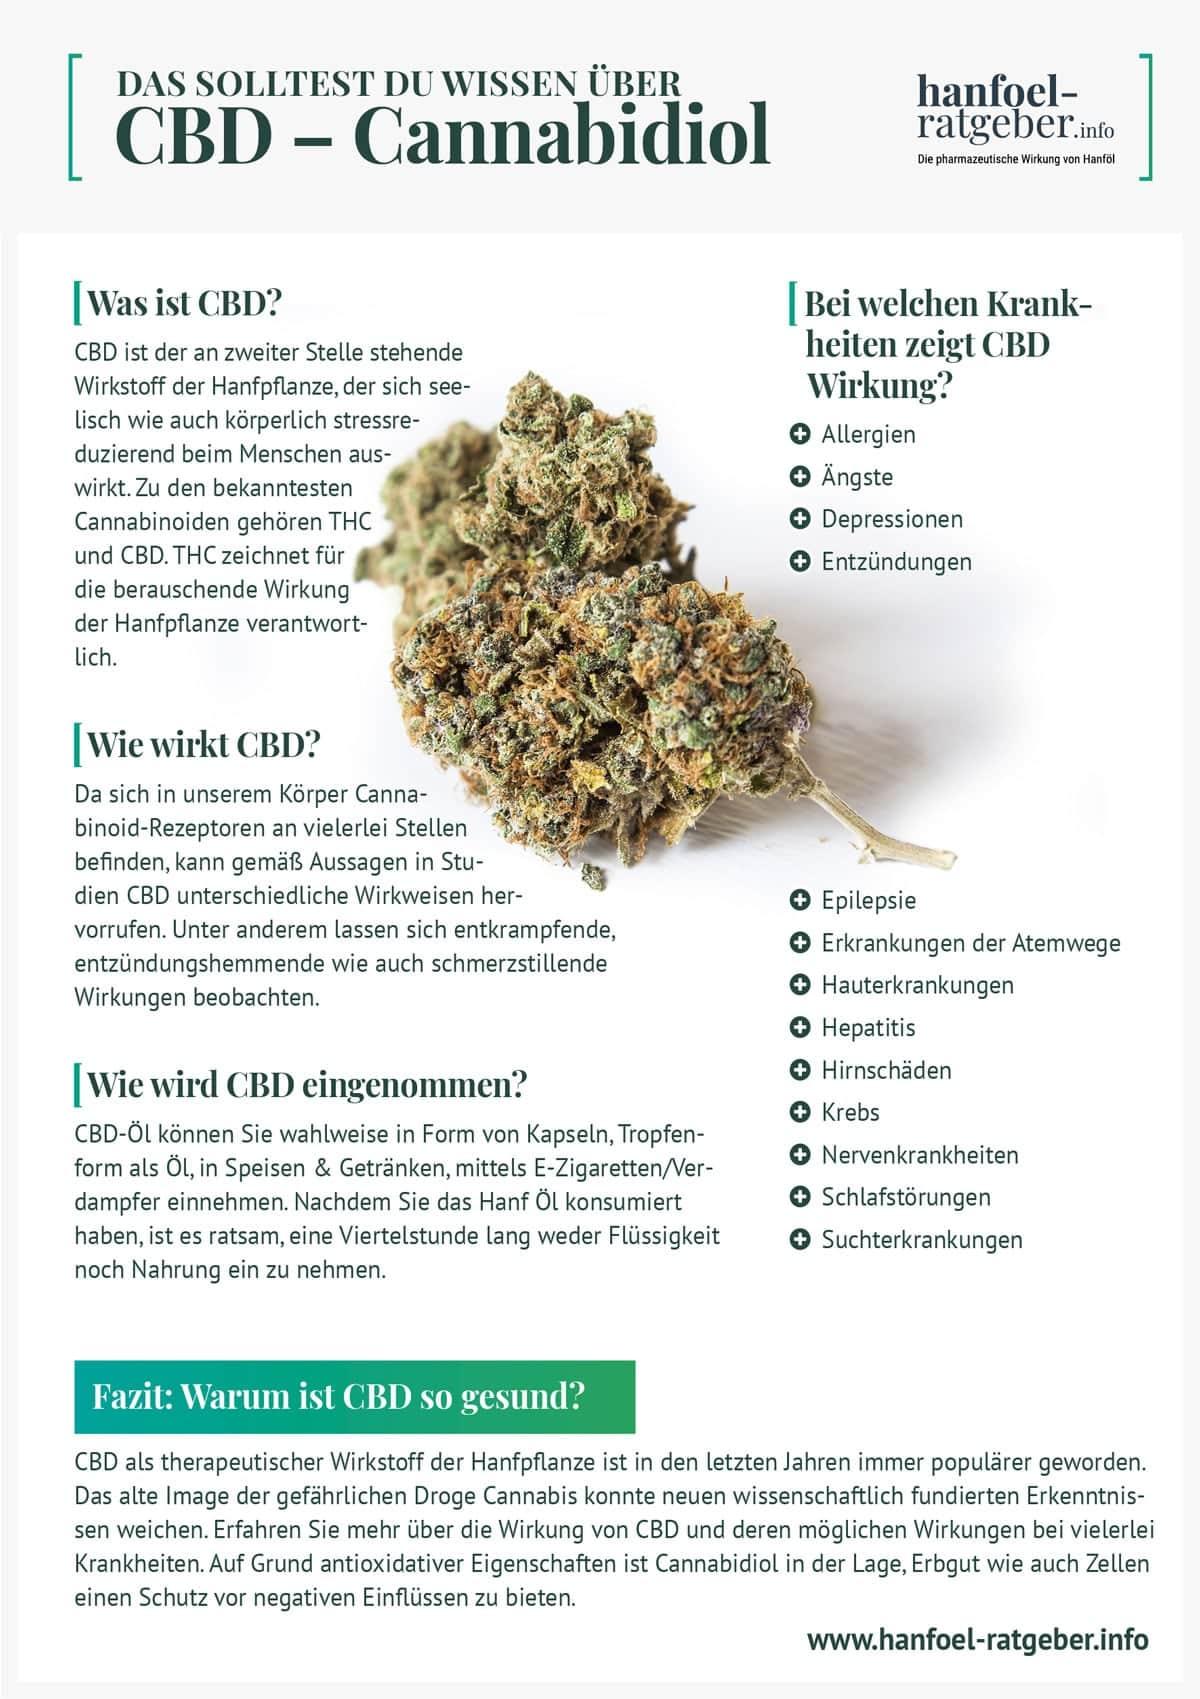 infografik_CBD_Hanfoel-Ratgeber